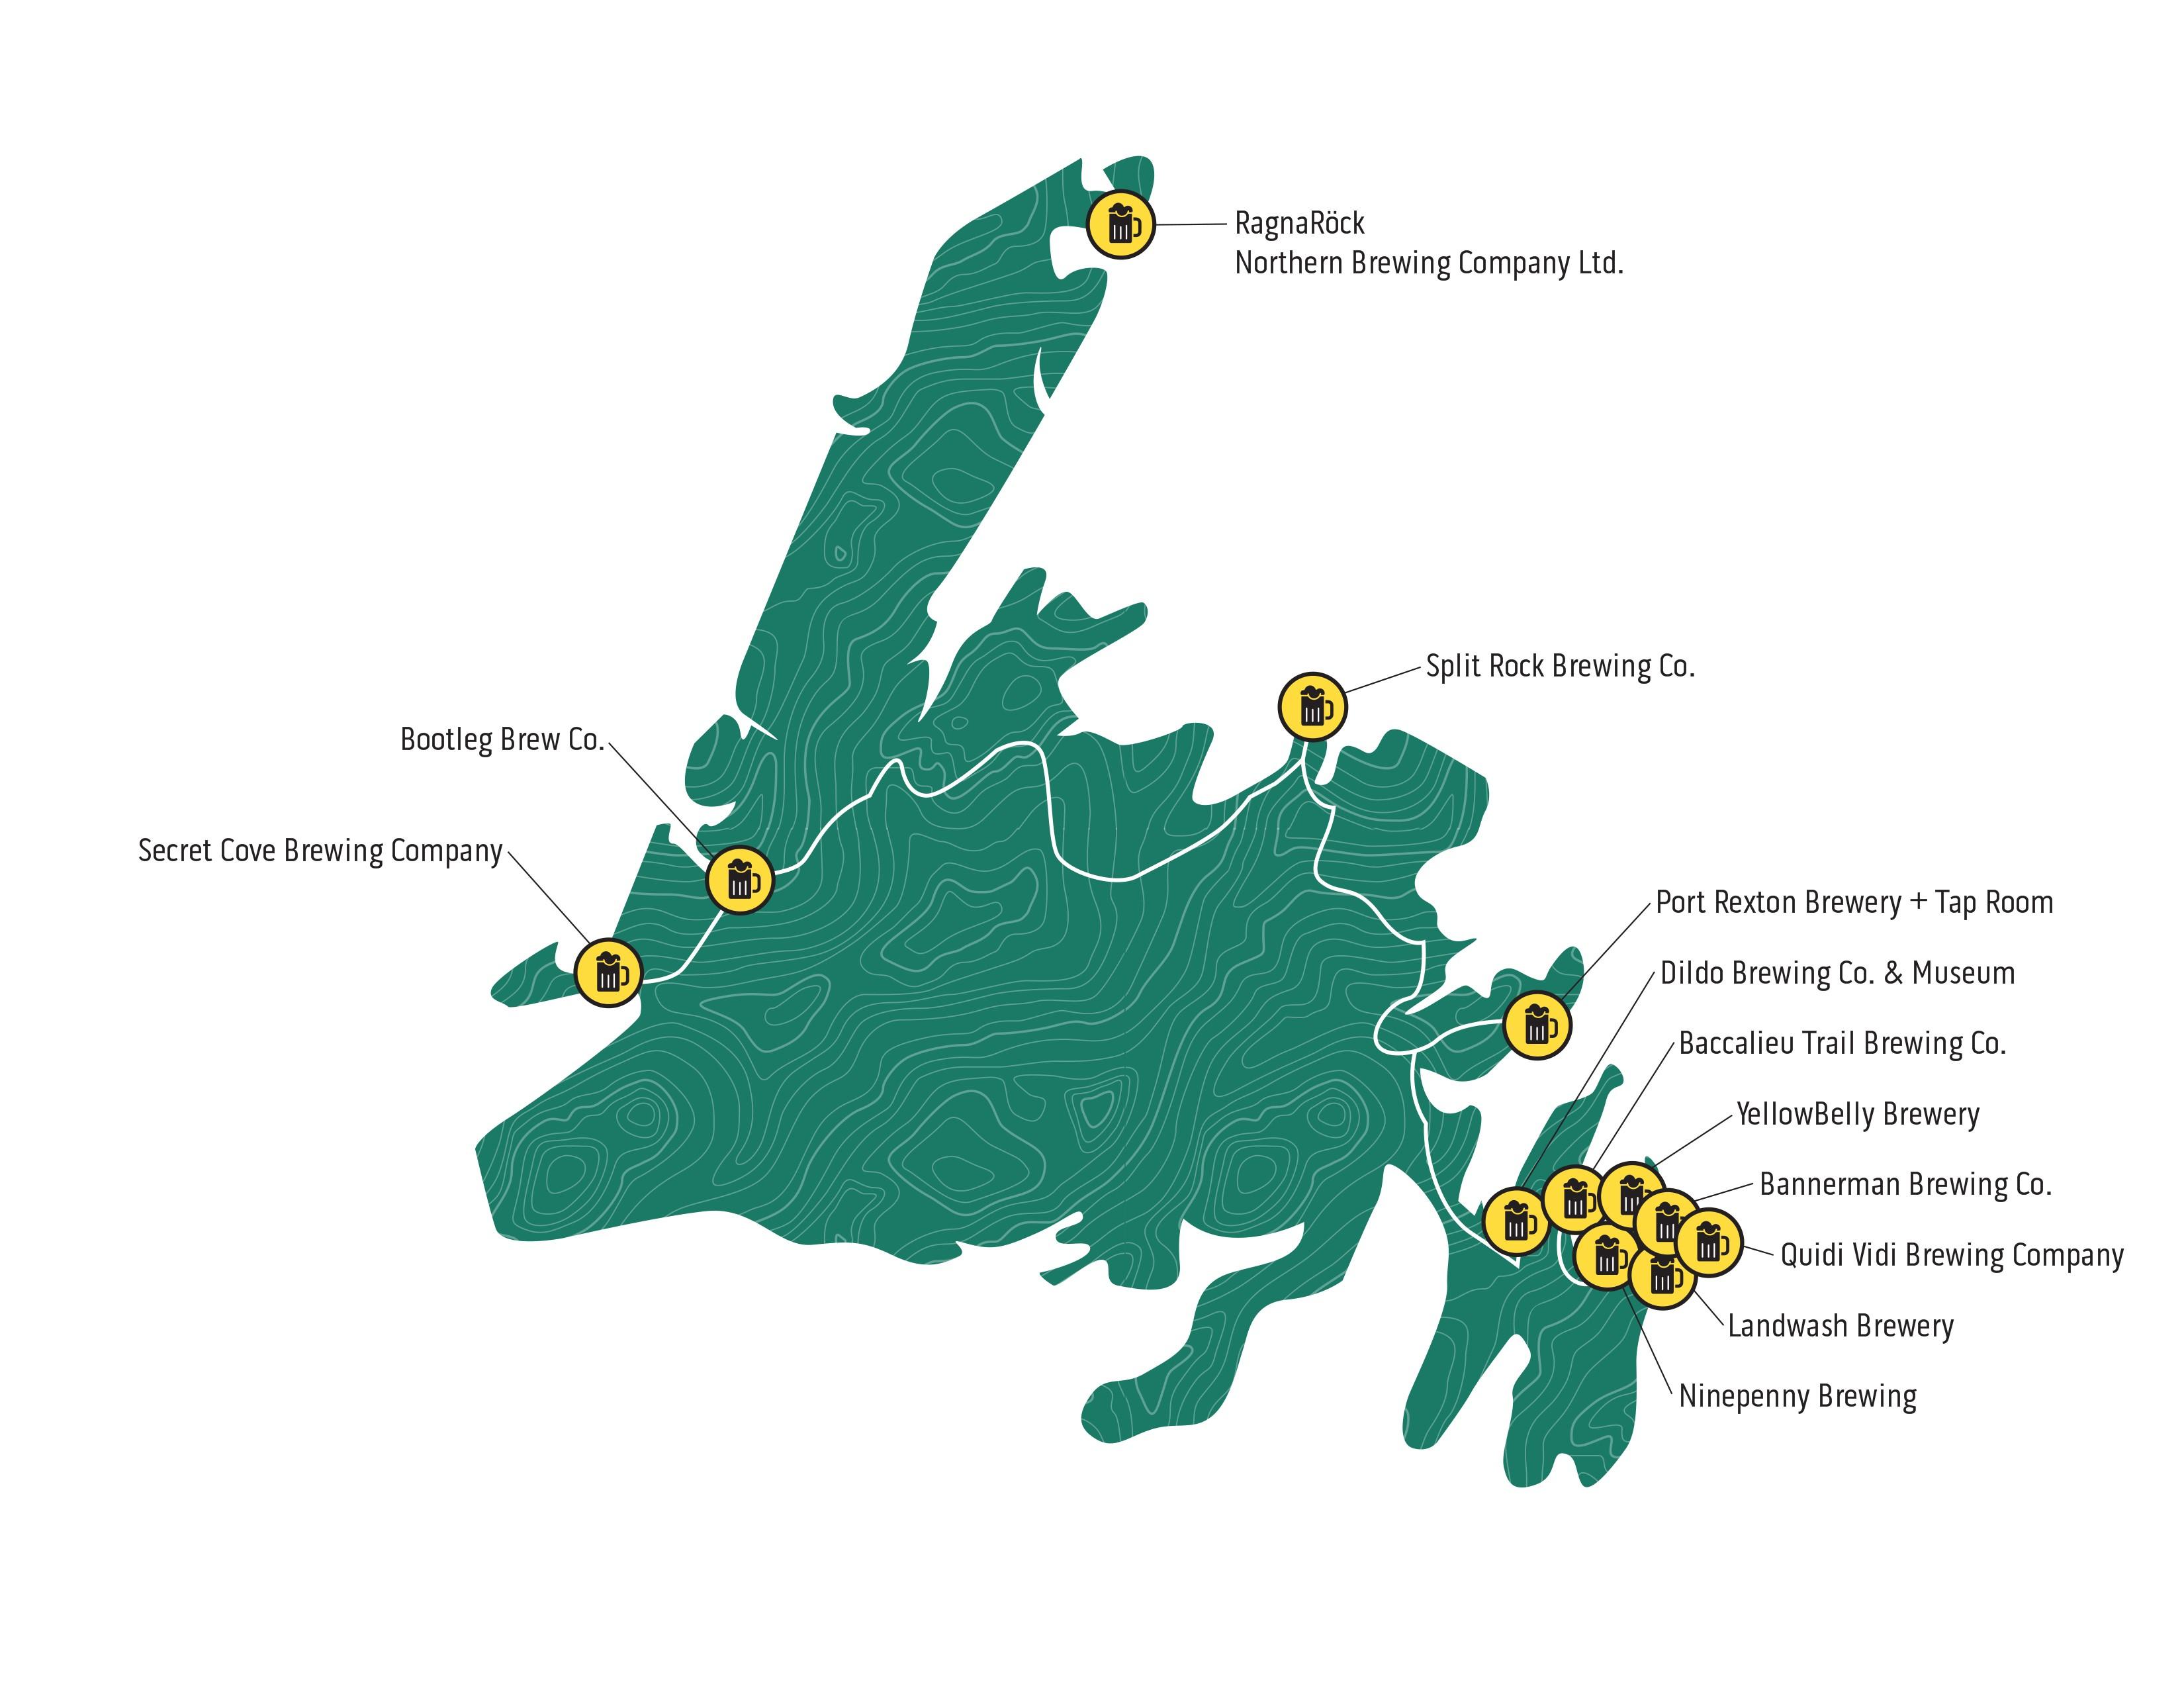 Newfoundland and Labrador Craft Beer Map